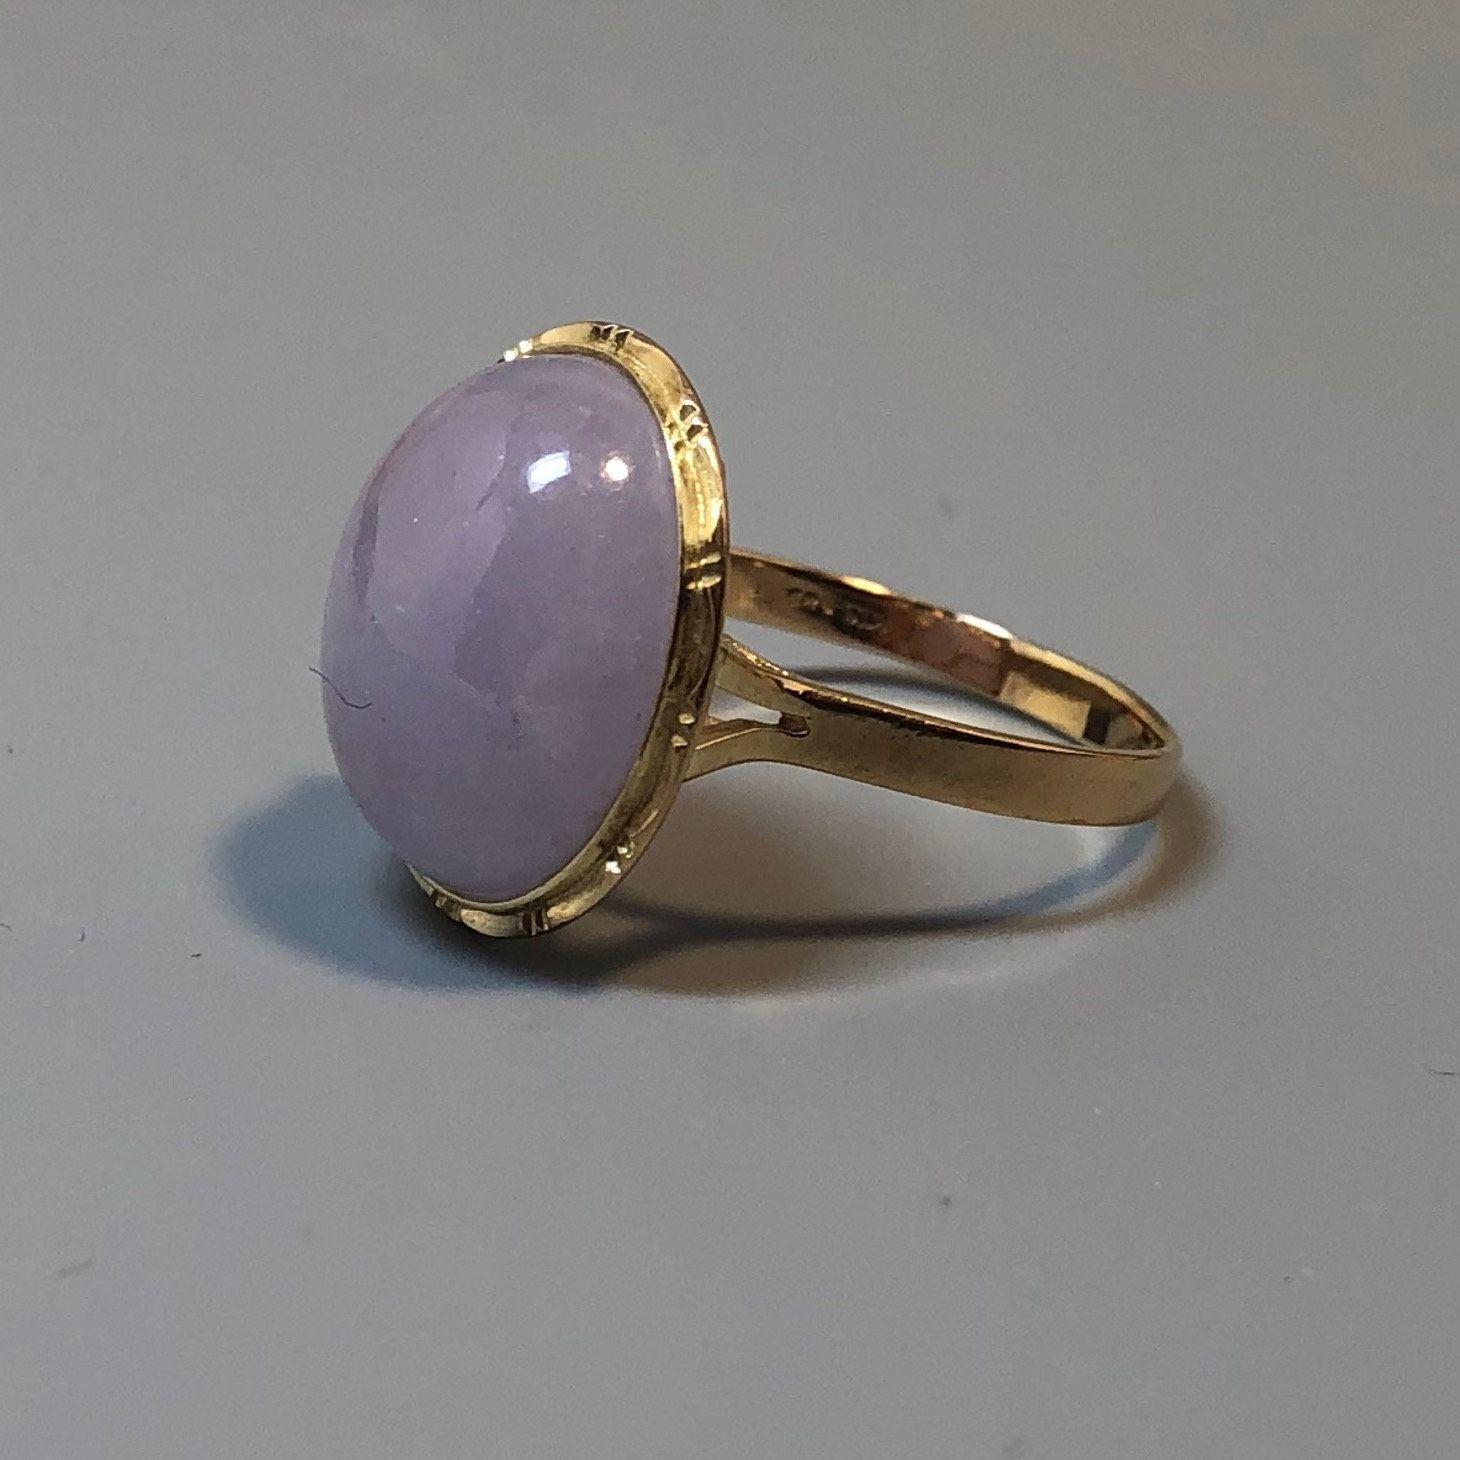 Vintage 18K Solid Yellow Gold Natural Purple Lavender Green Jadeite Jade Ring Size 7